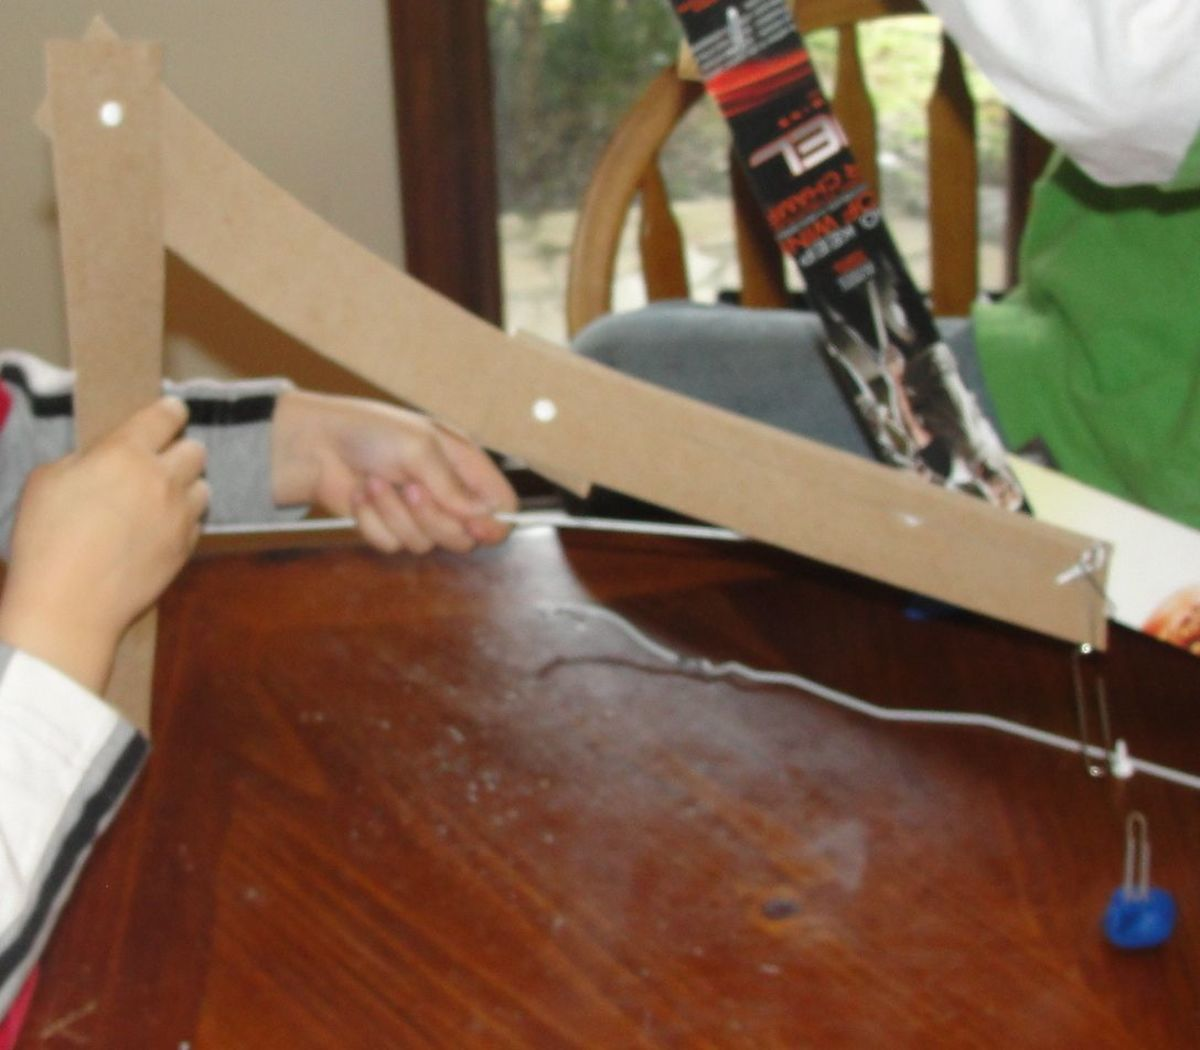 Robot arm model